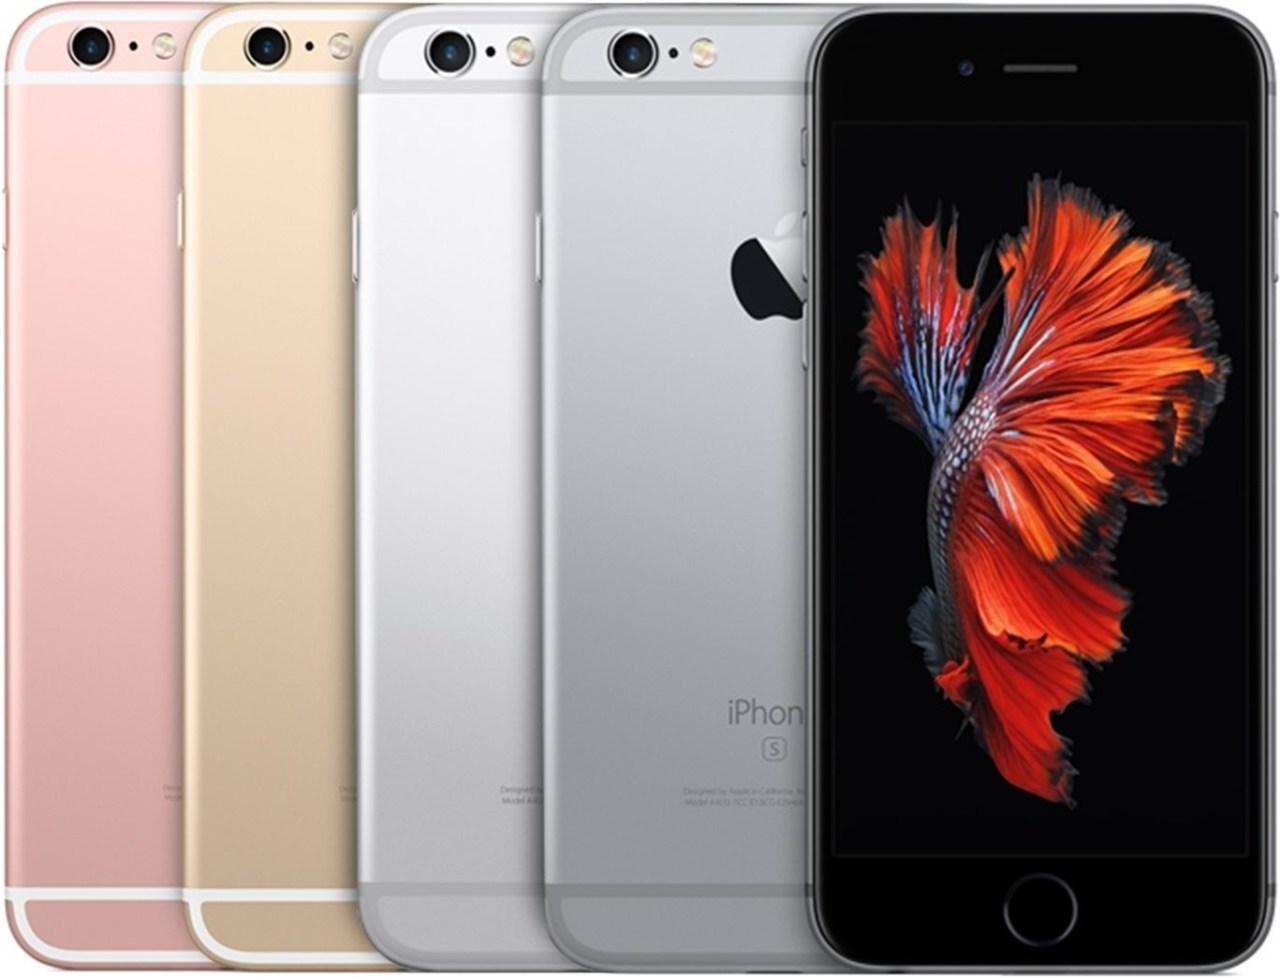 Apple Iphone 6s Plus 16gb Od 35999 Pricemania 6